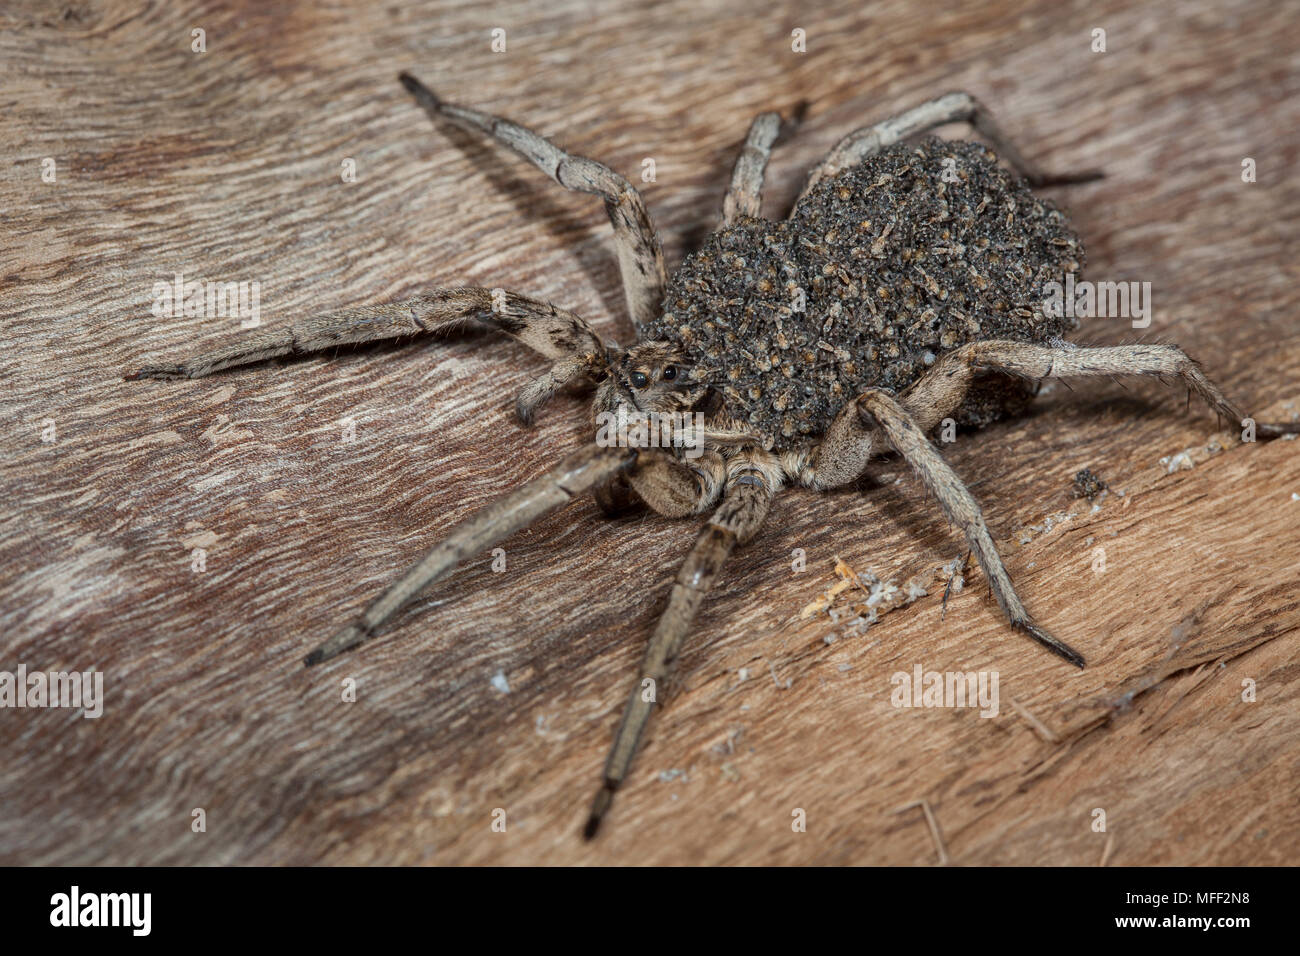 Wolfspider (Venatrix spp.?), Fam. Lycosidae, Female carying spiderlings, Warrumbungle National Park, New South Wales, Australia - Stock Image